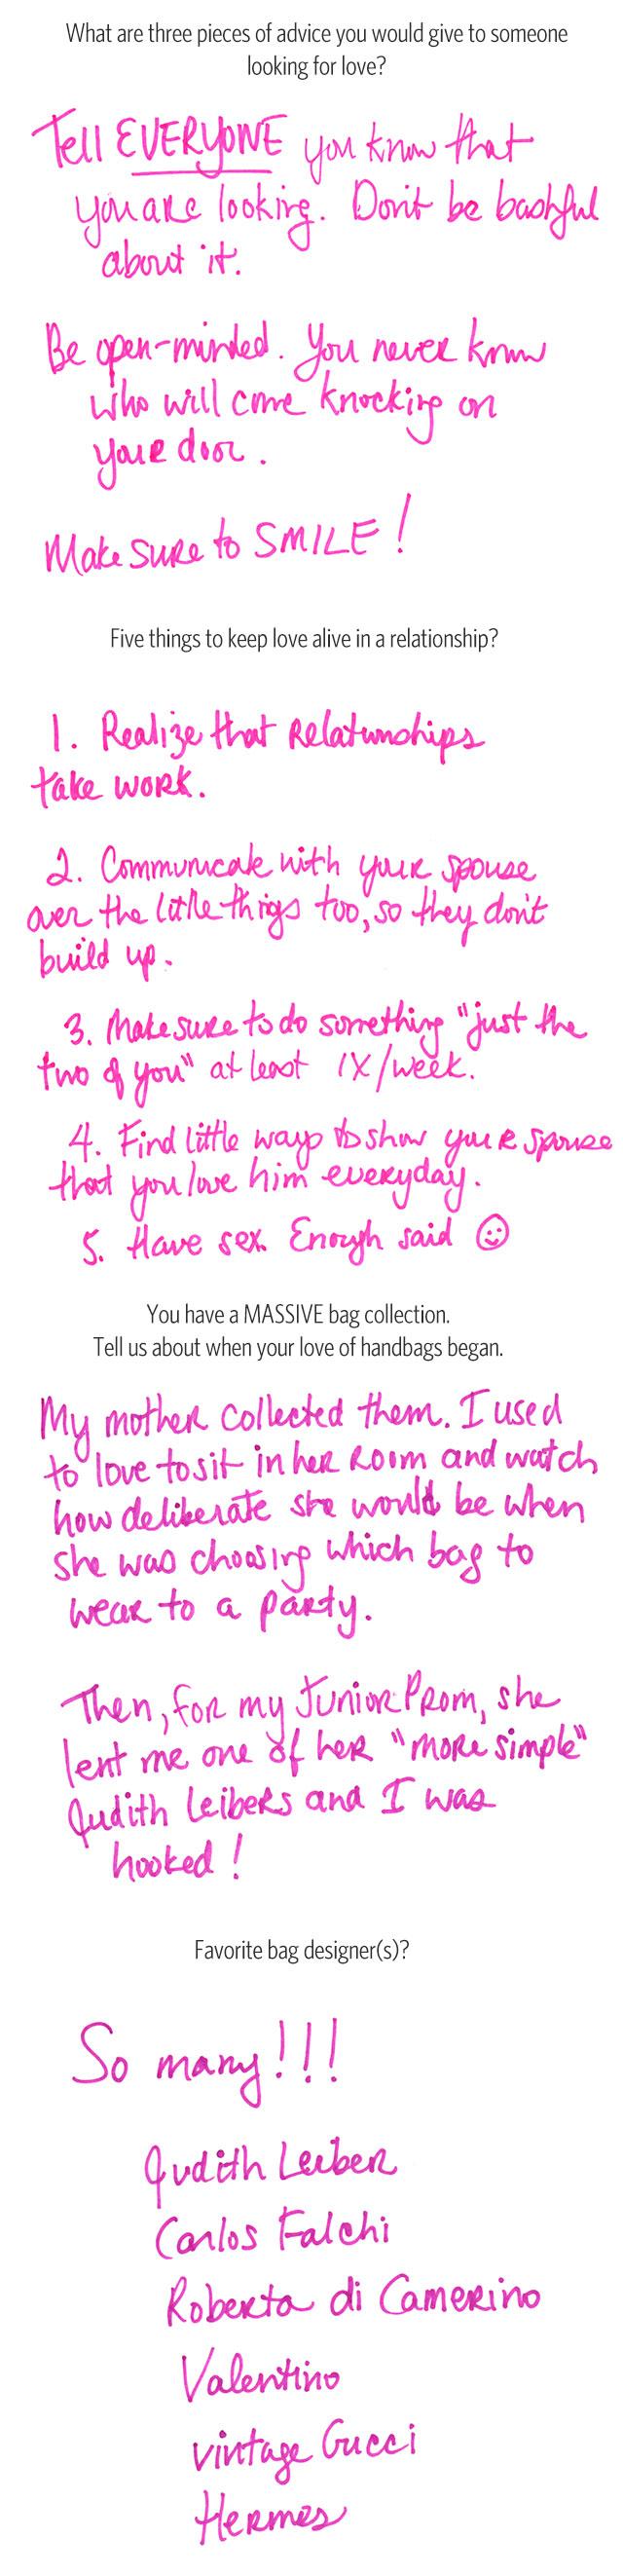 What's In Her Bag: Samantha Daniels (2)